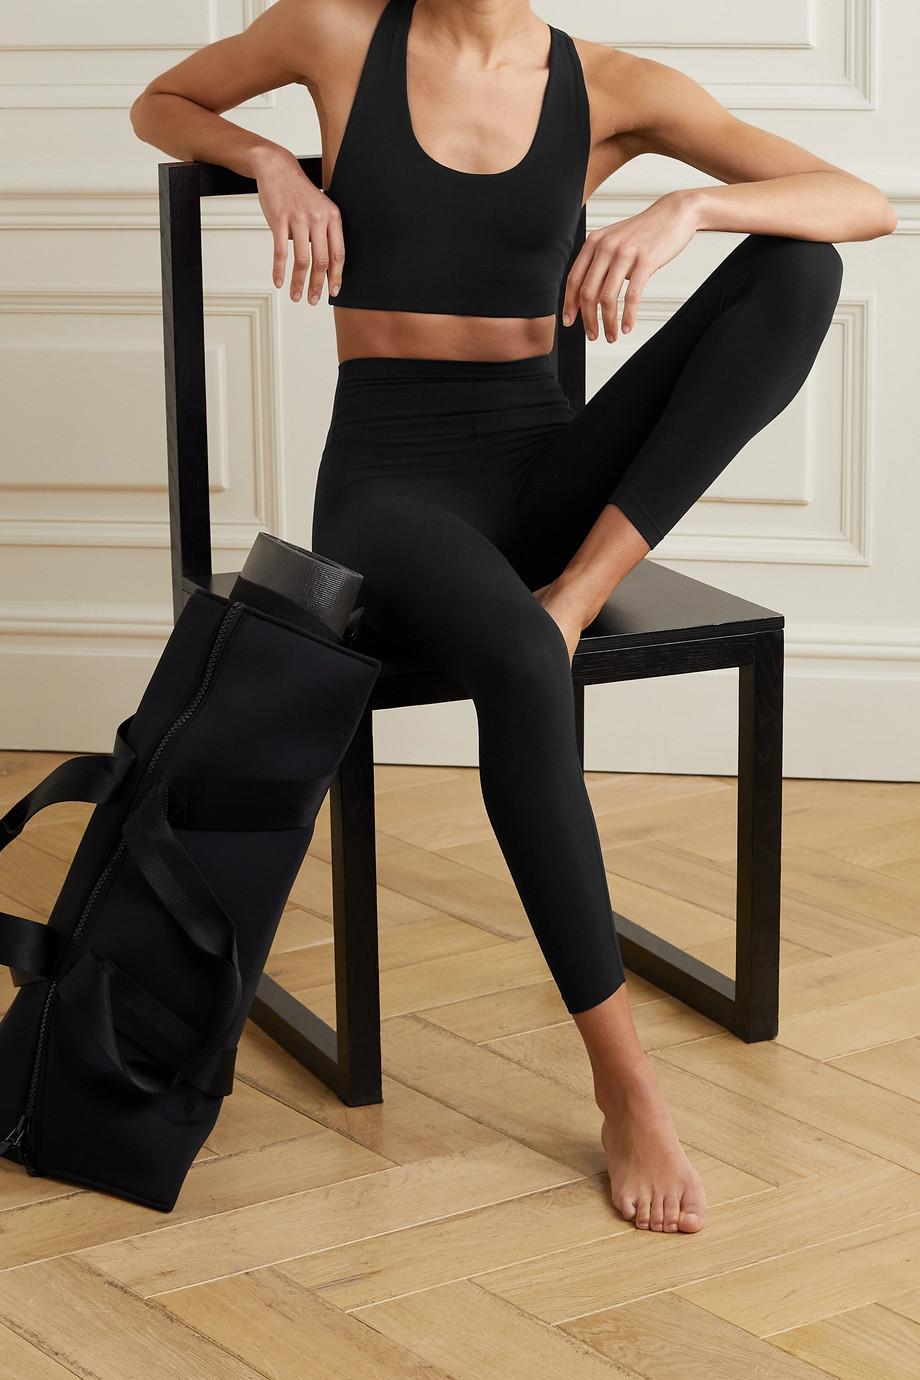 Splits59 Sara stretch sports bra